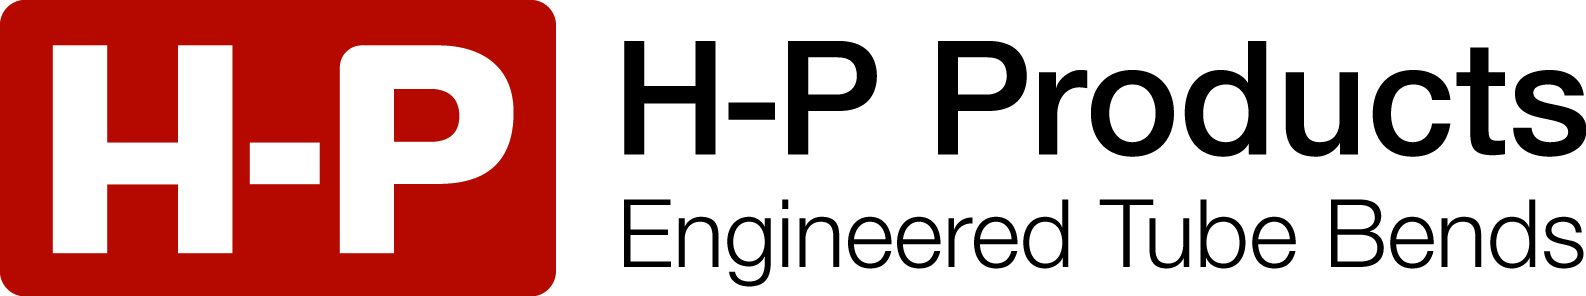 HP_TB_Horiz_4c